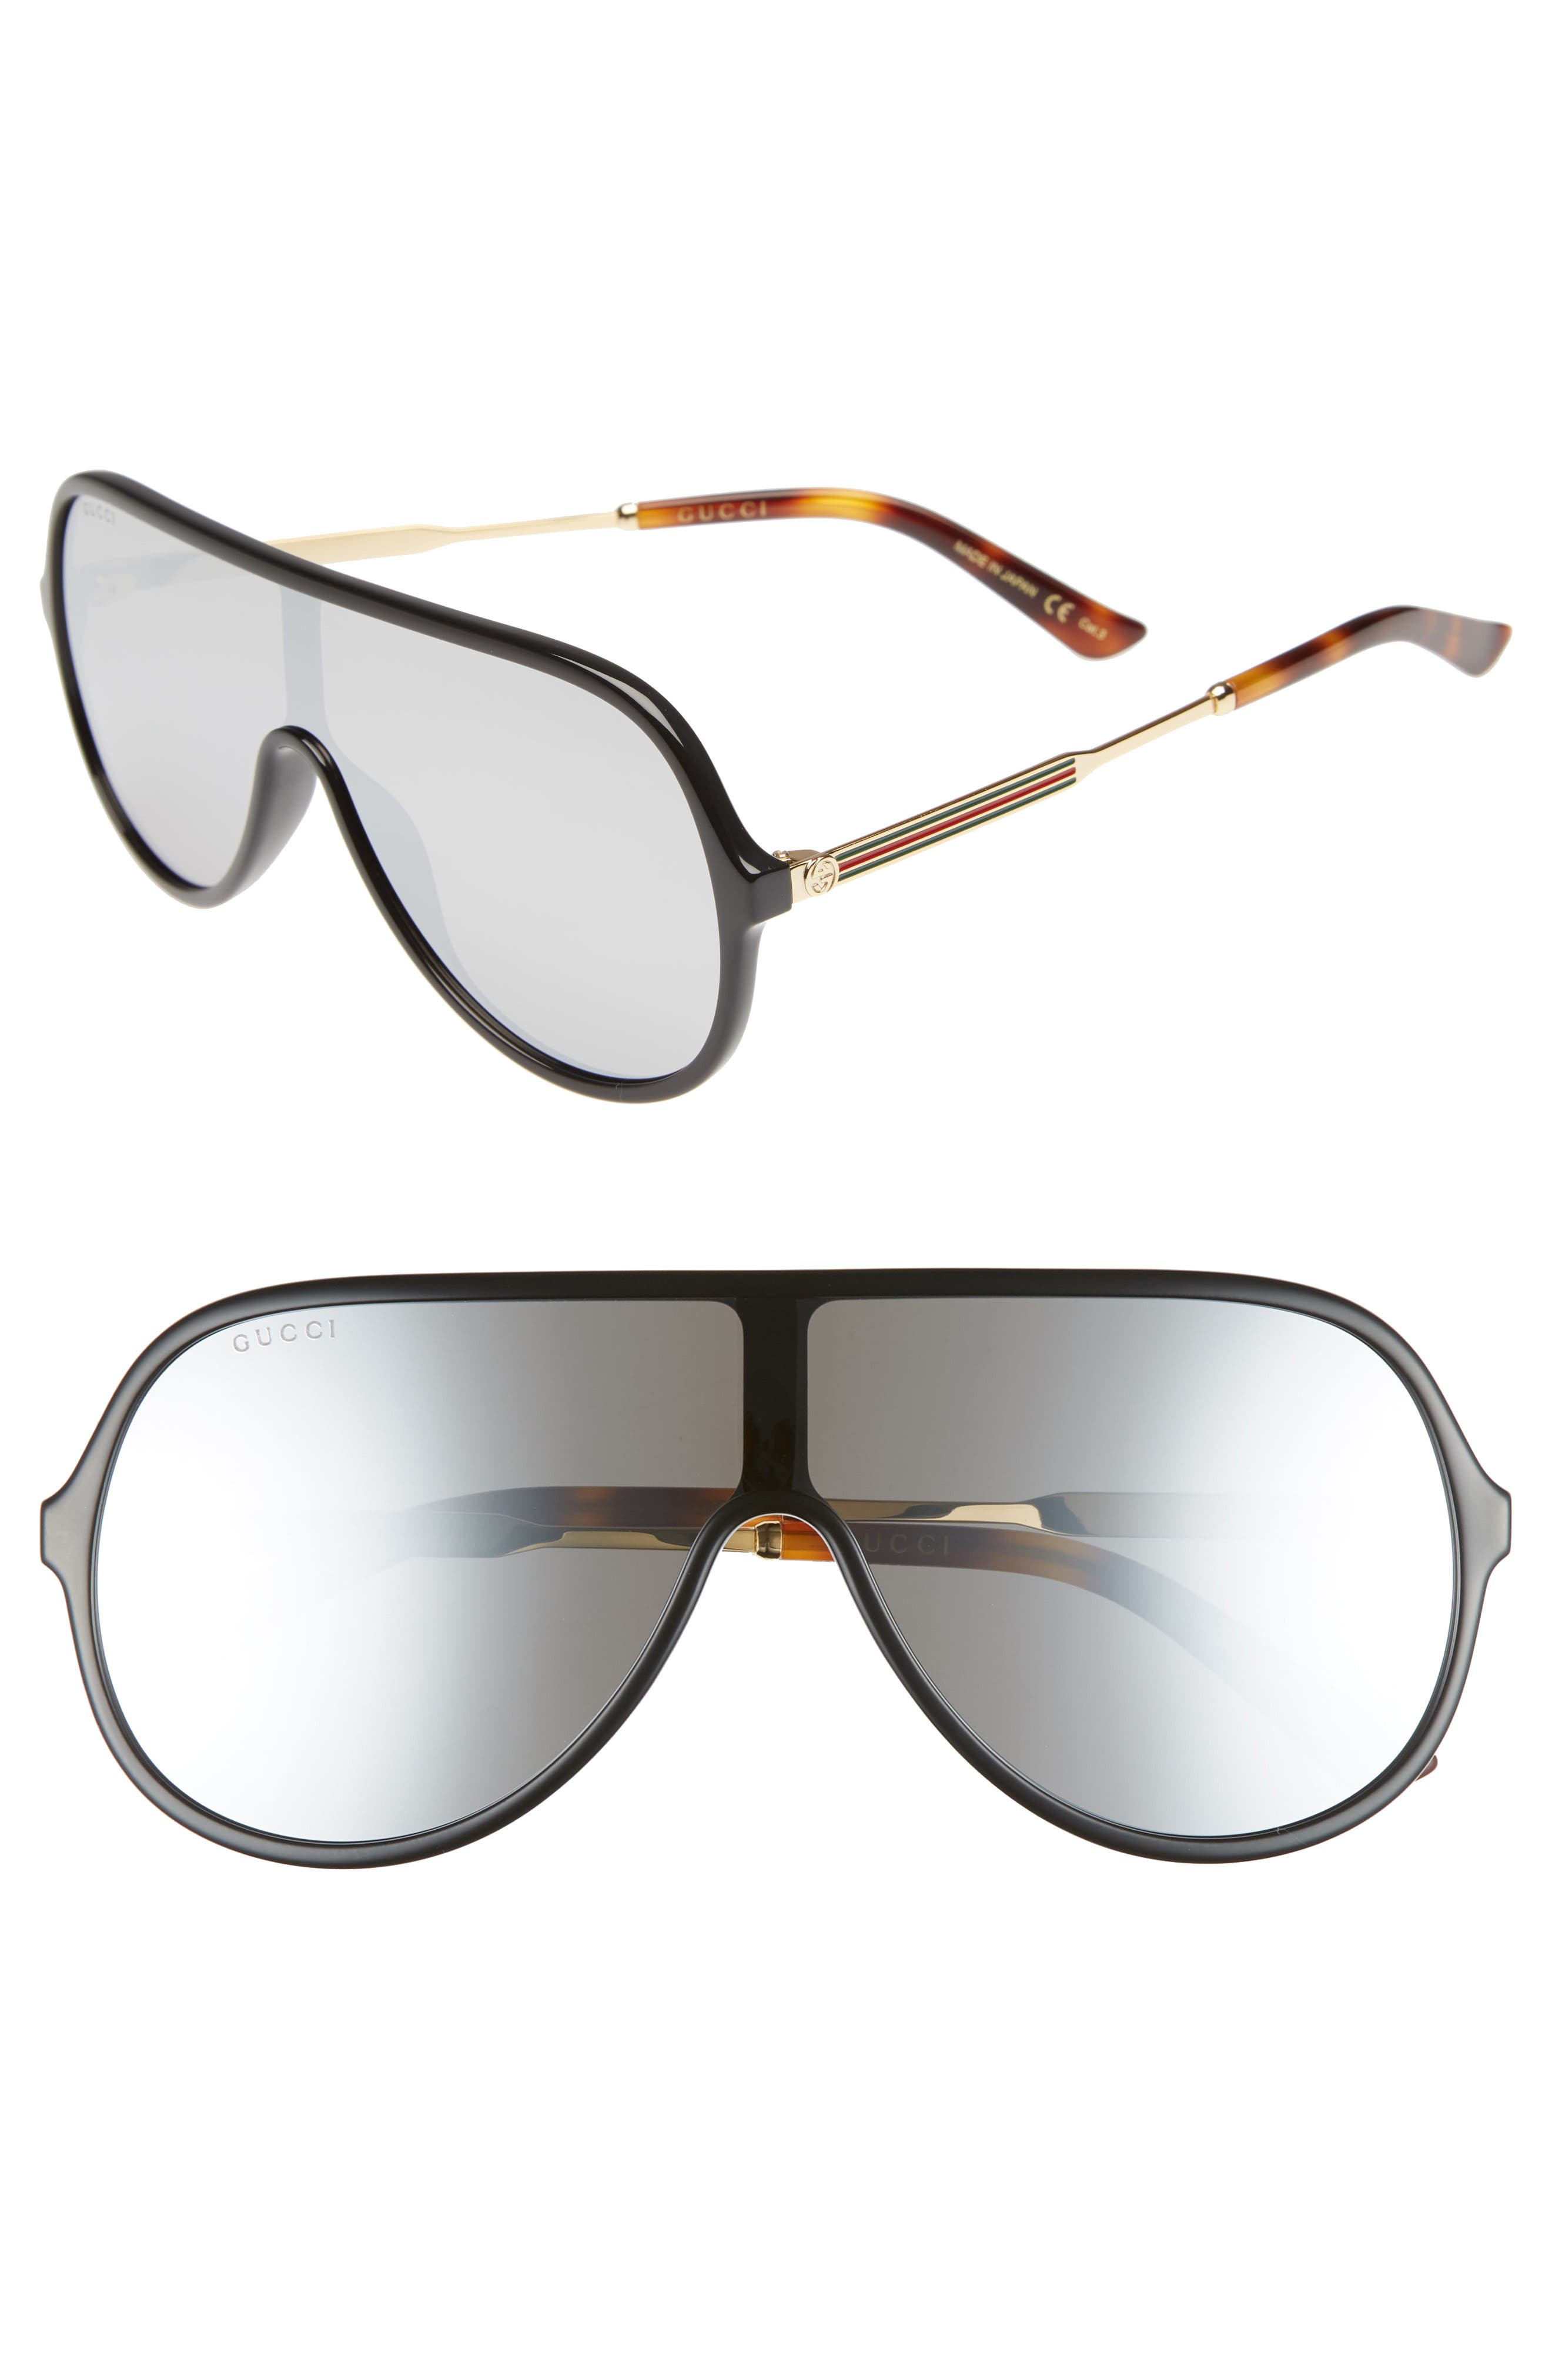 99mm Oversize Shield Sunglasses,                             Main thumbnail 1, color,                             Black